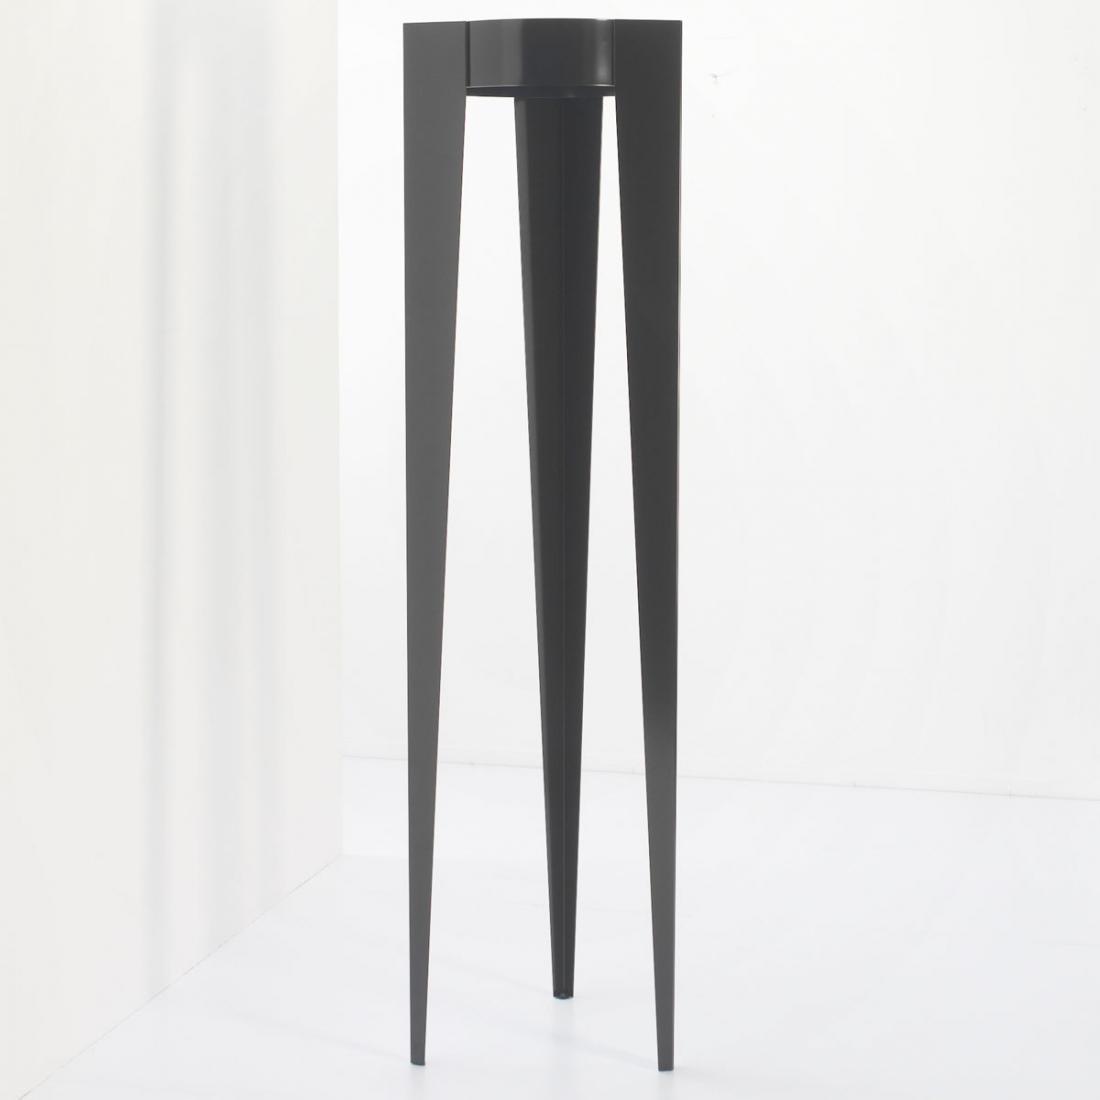 d coration et meubles d 39 entr e design zendart design. Black Bedroom Furniture Sets. Home Design Ideas